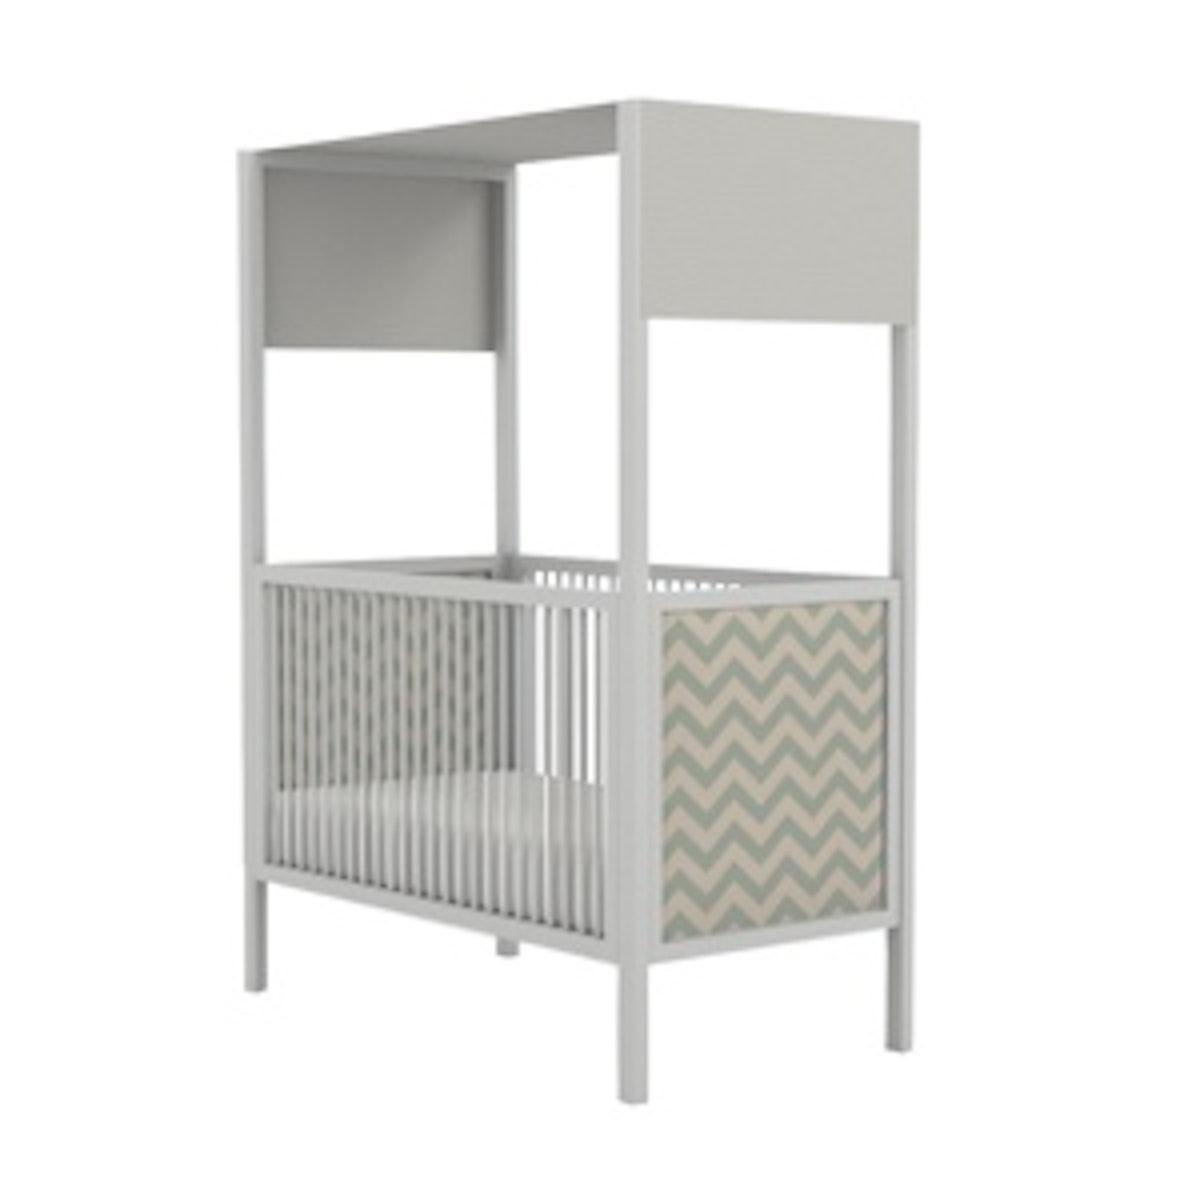 Canopy Baby Crib